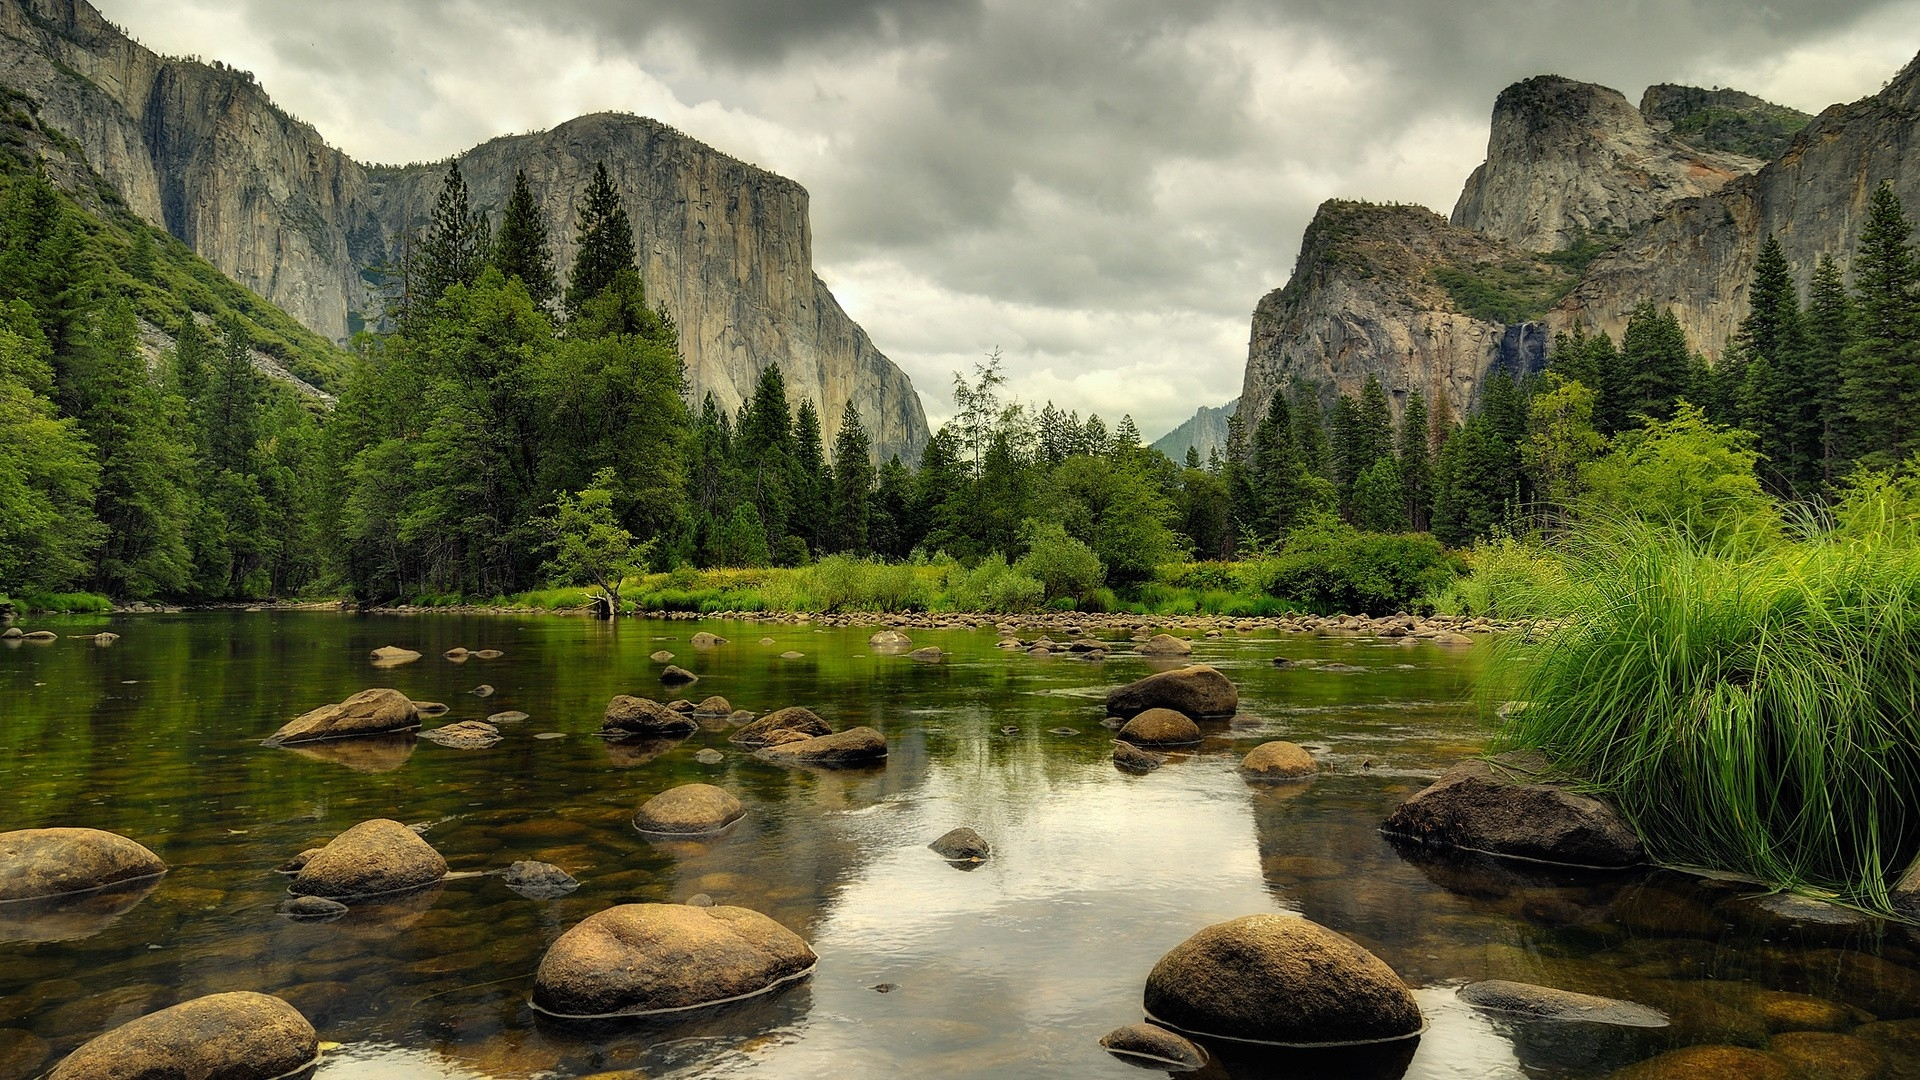 Free Download Forest Small River Desktop Wallpaper Hd